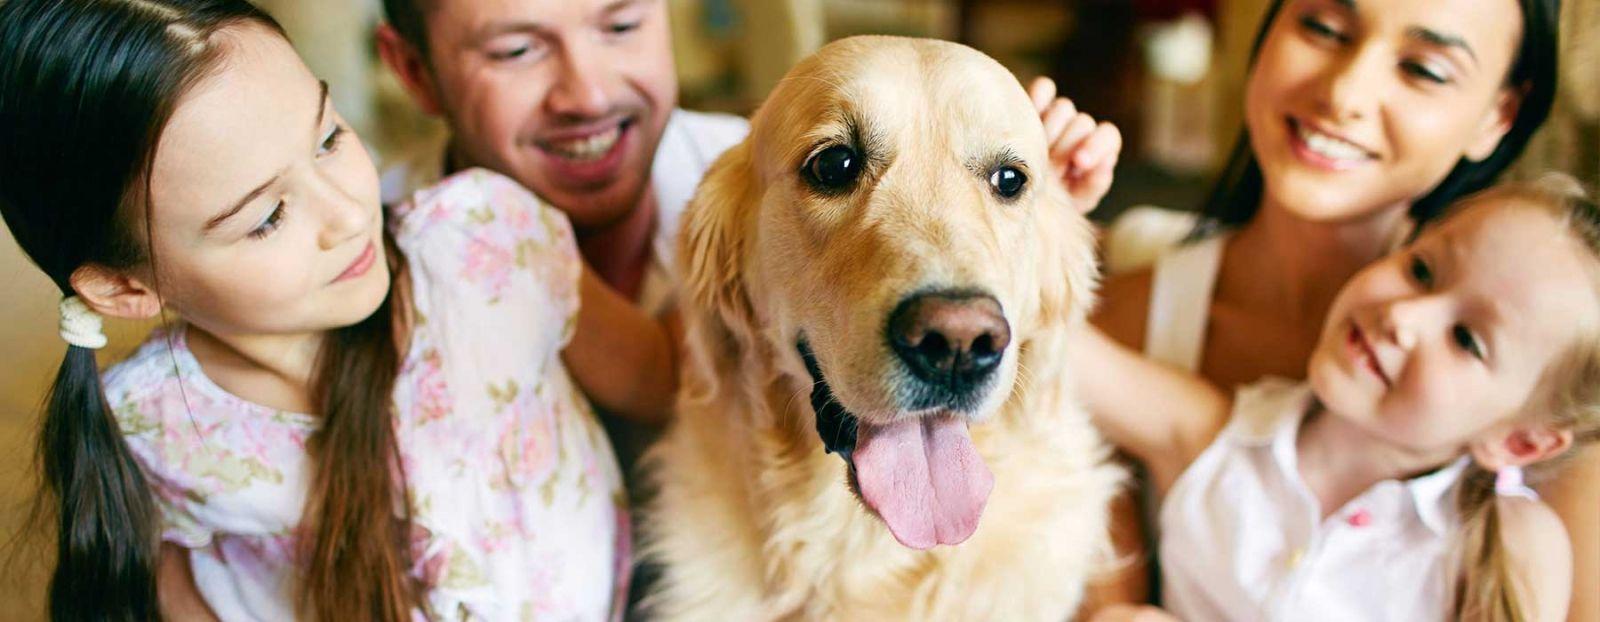 Country Veterinary Clinic - Veterinarian in Live Oak